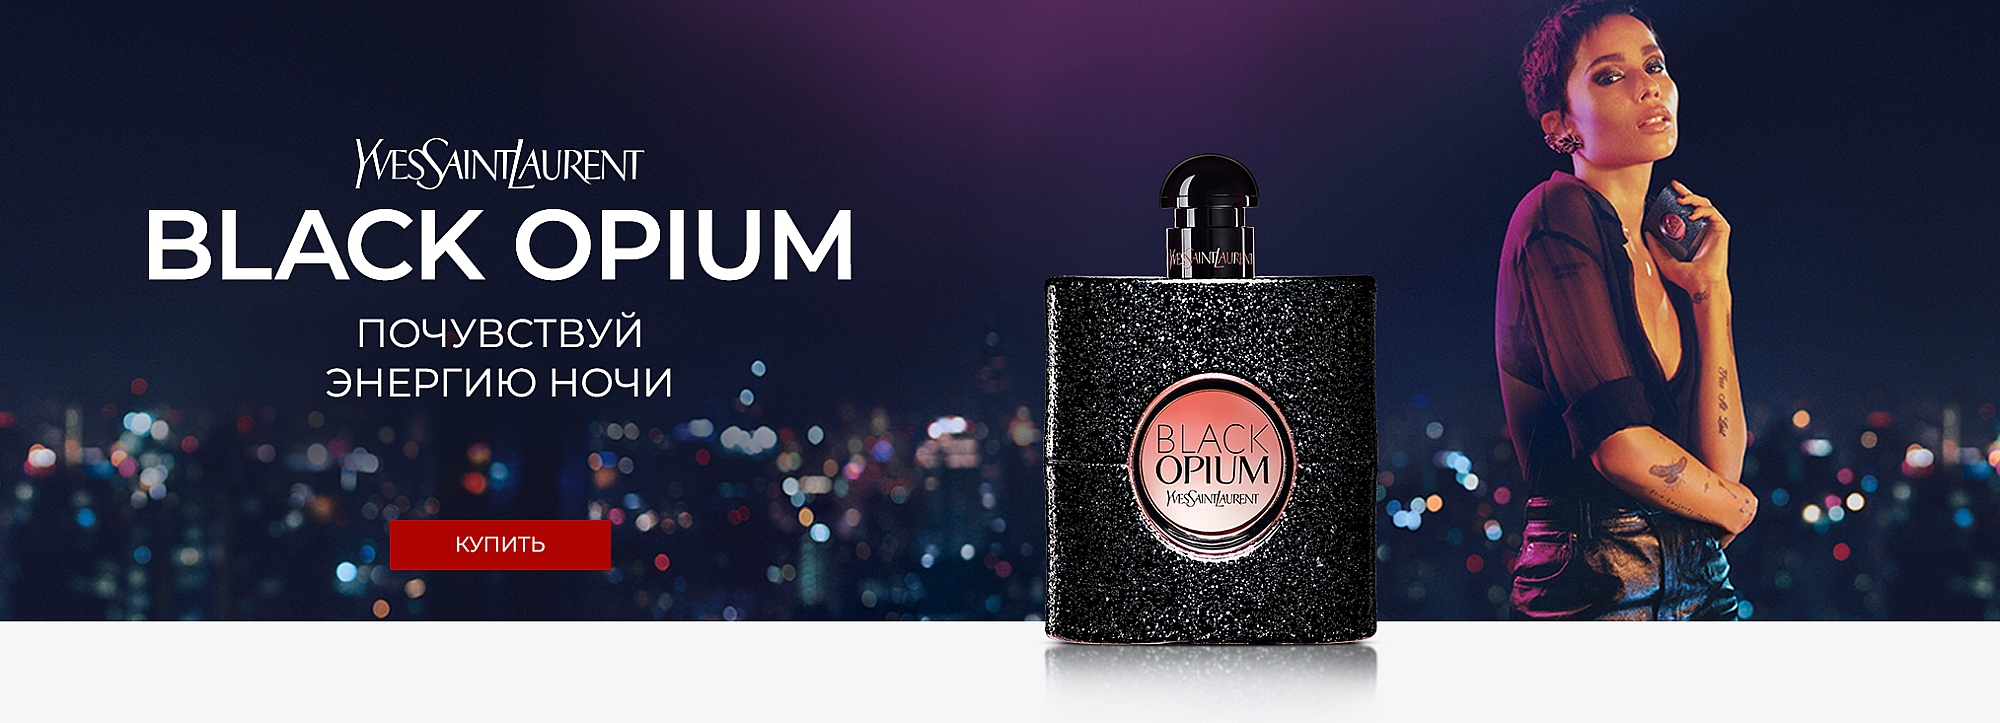 Yves Saint Laurent Black Opium3